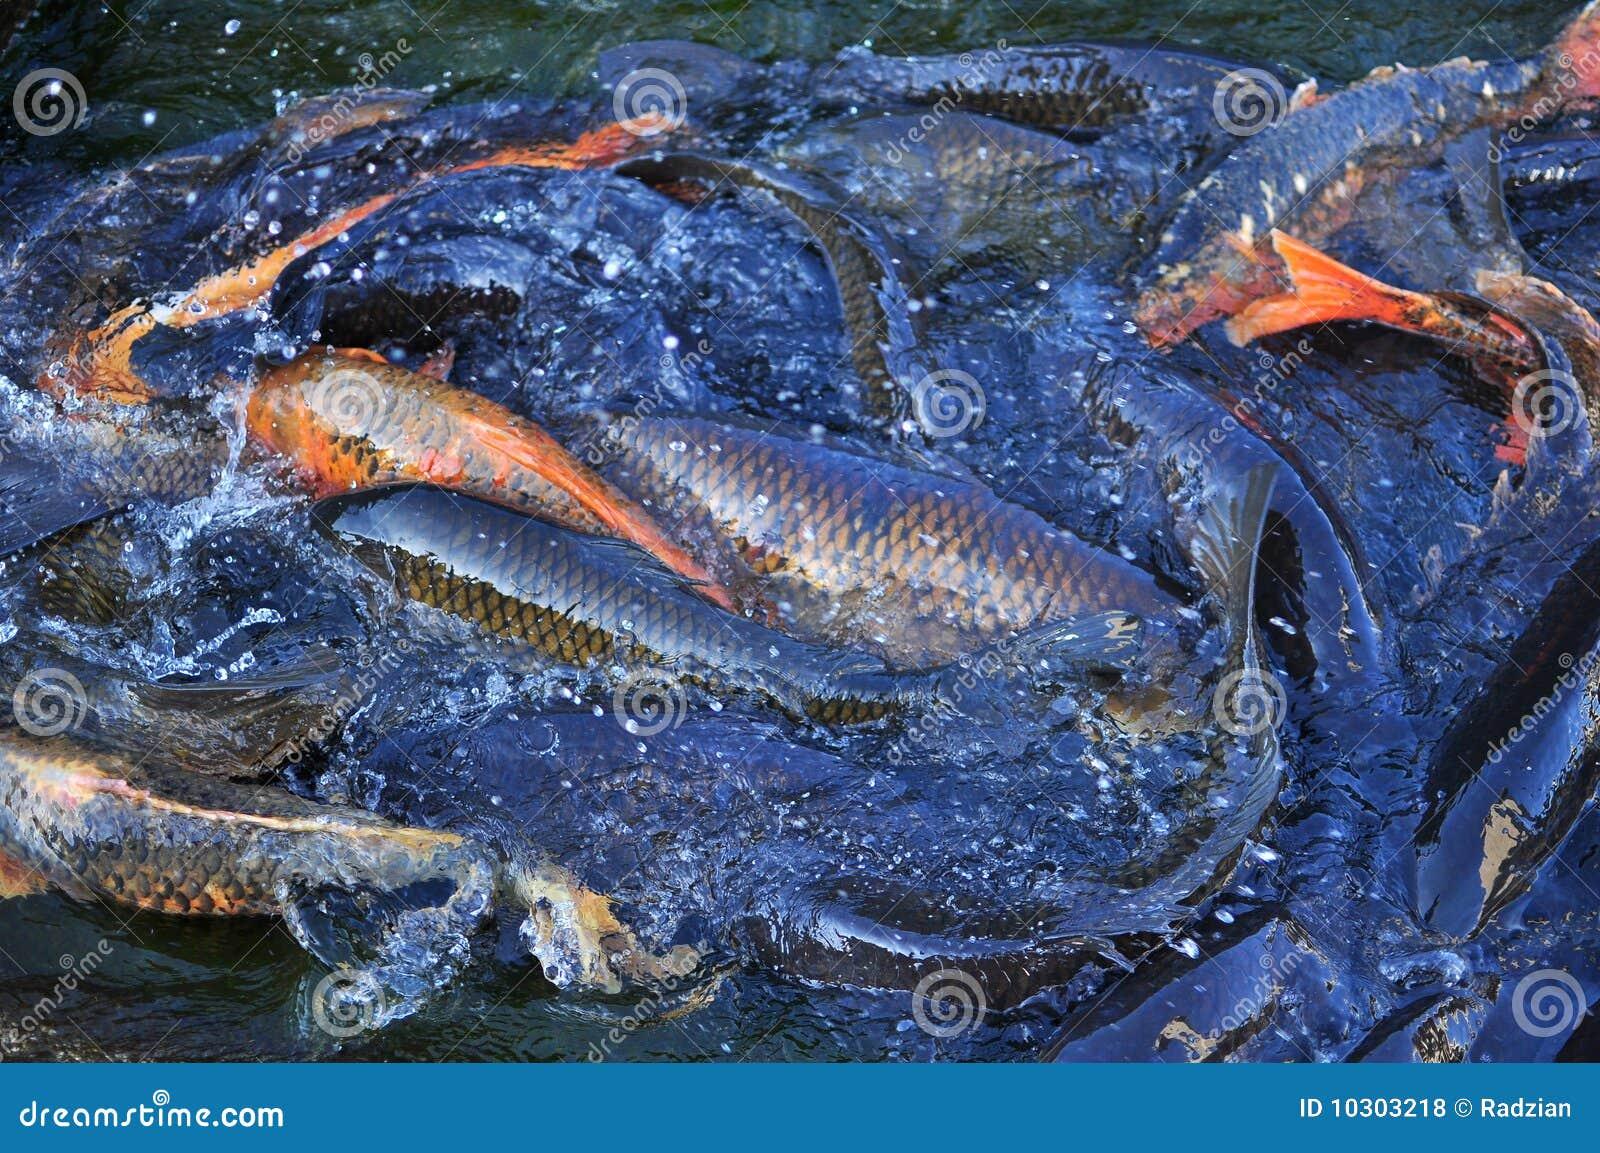 Koi carp fish royalty free stock photos image 10303218 for Fraie carpe koi